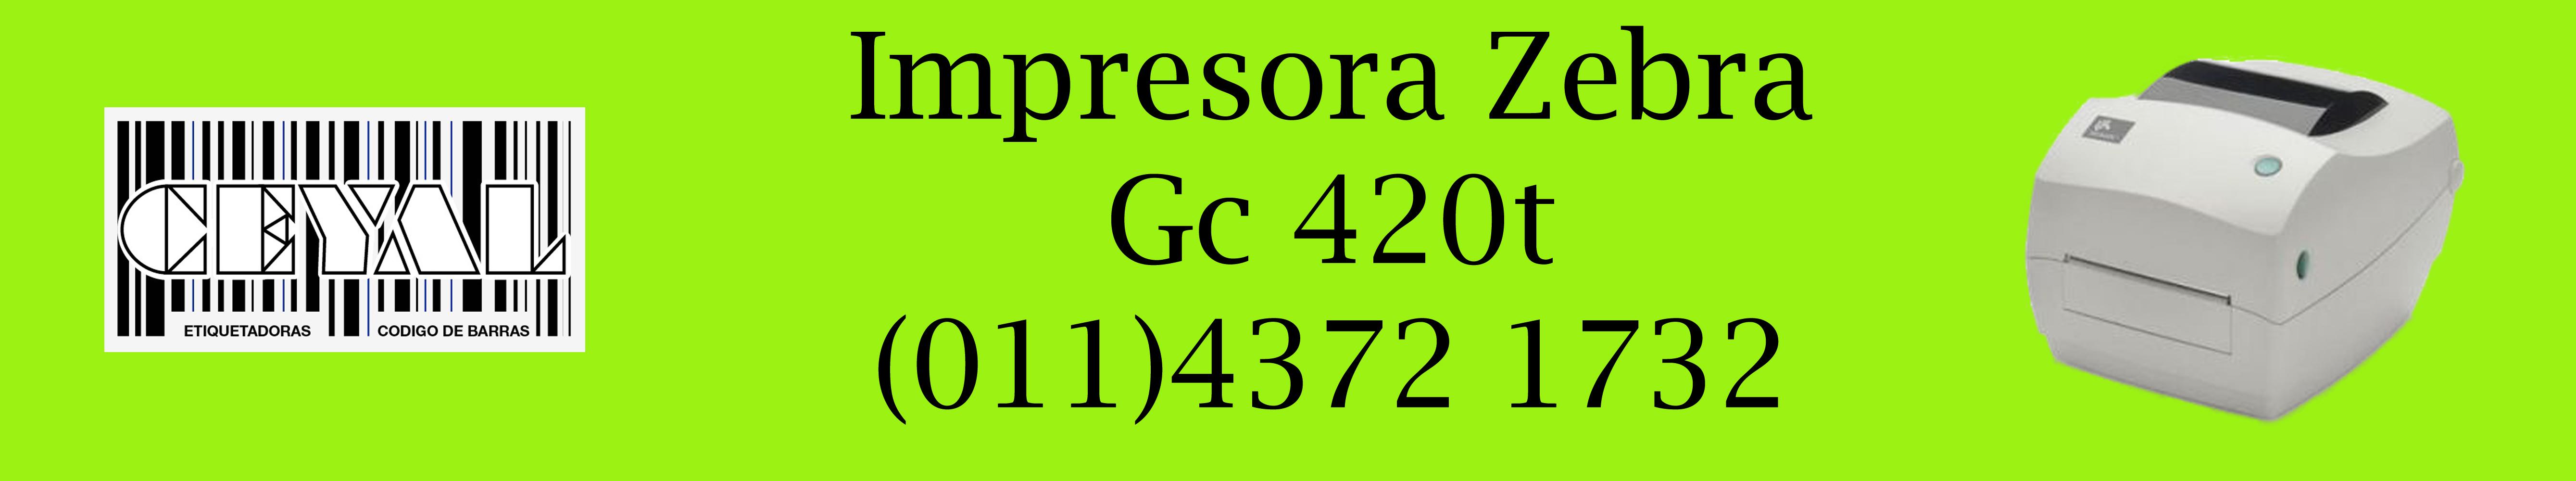 impresora zebra gc 420t